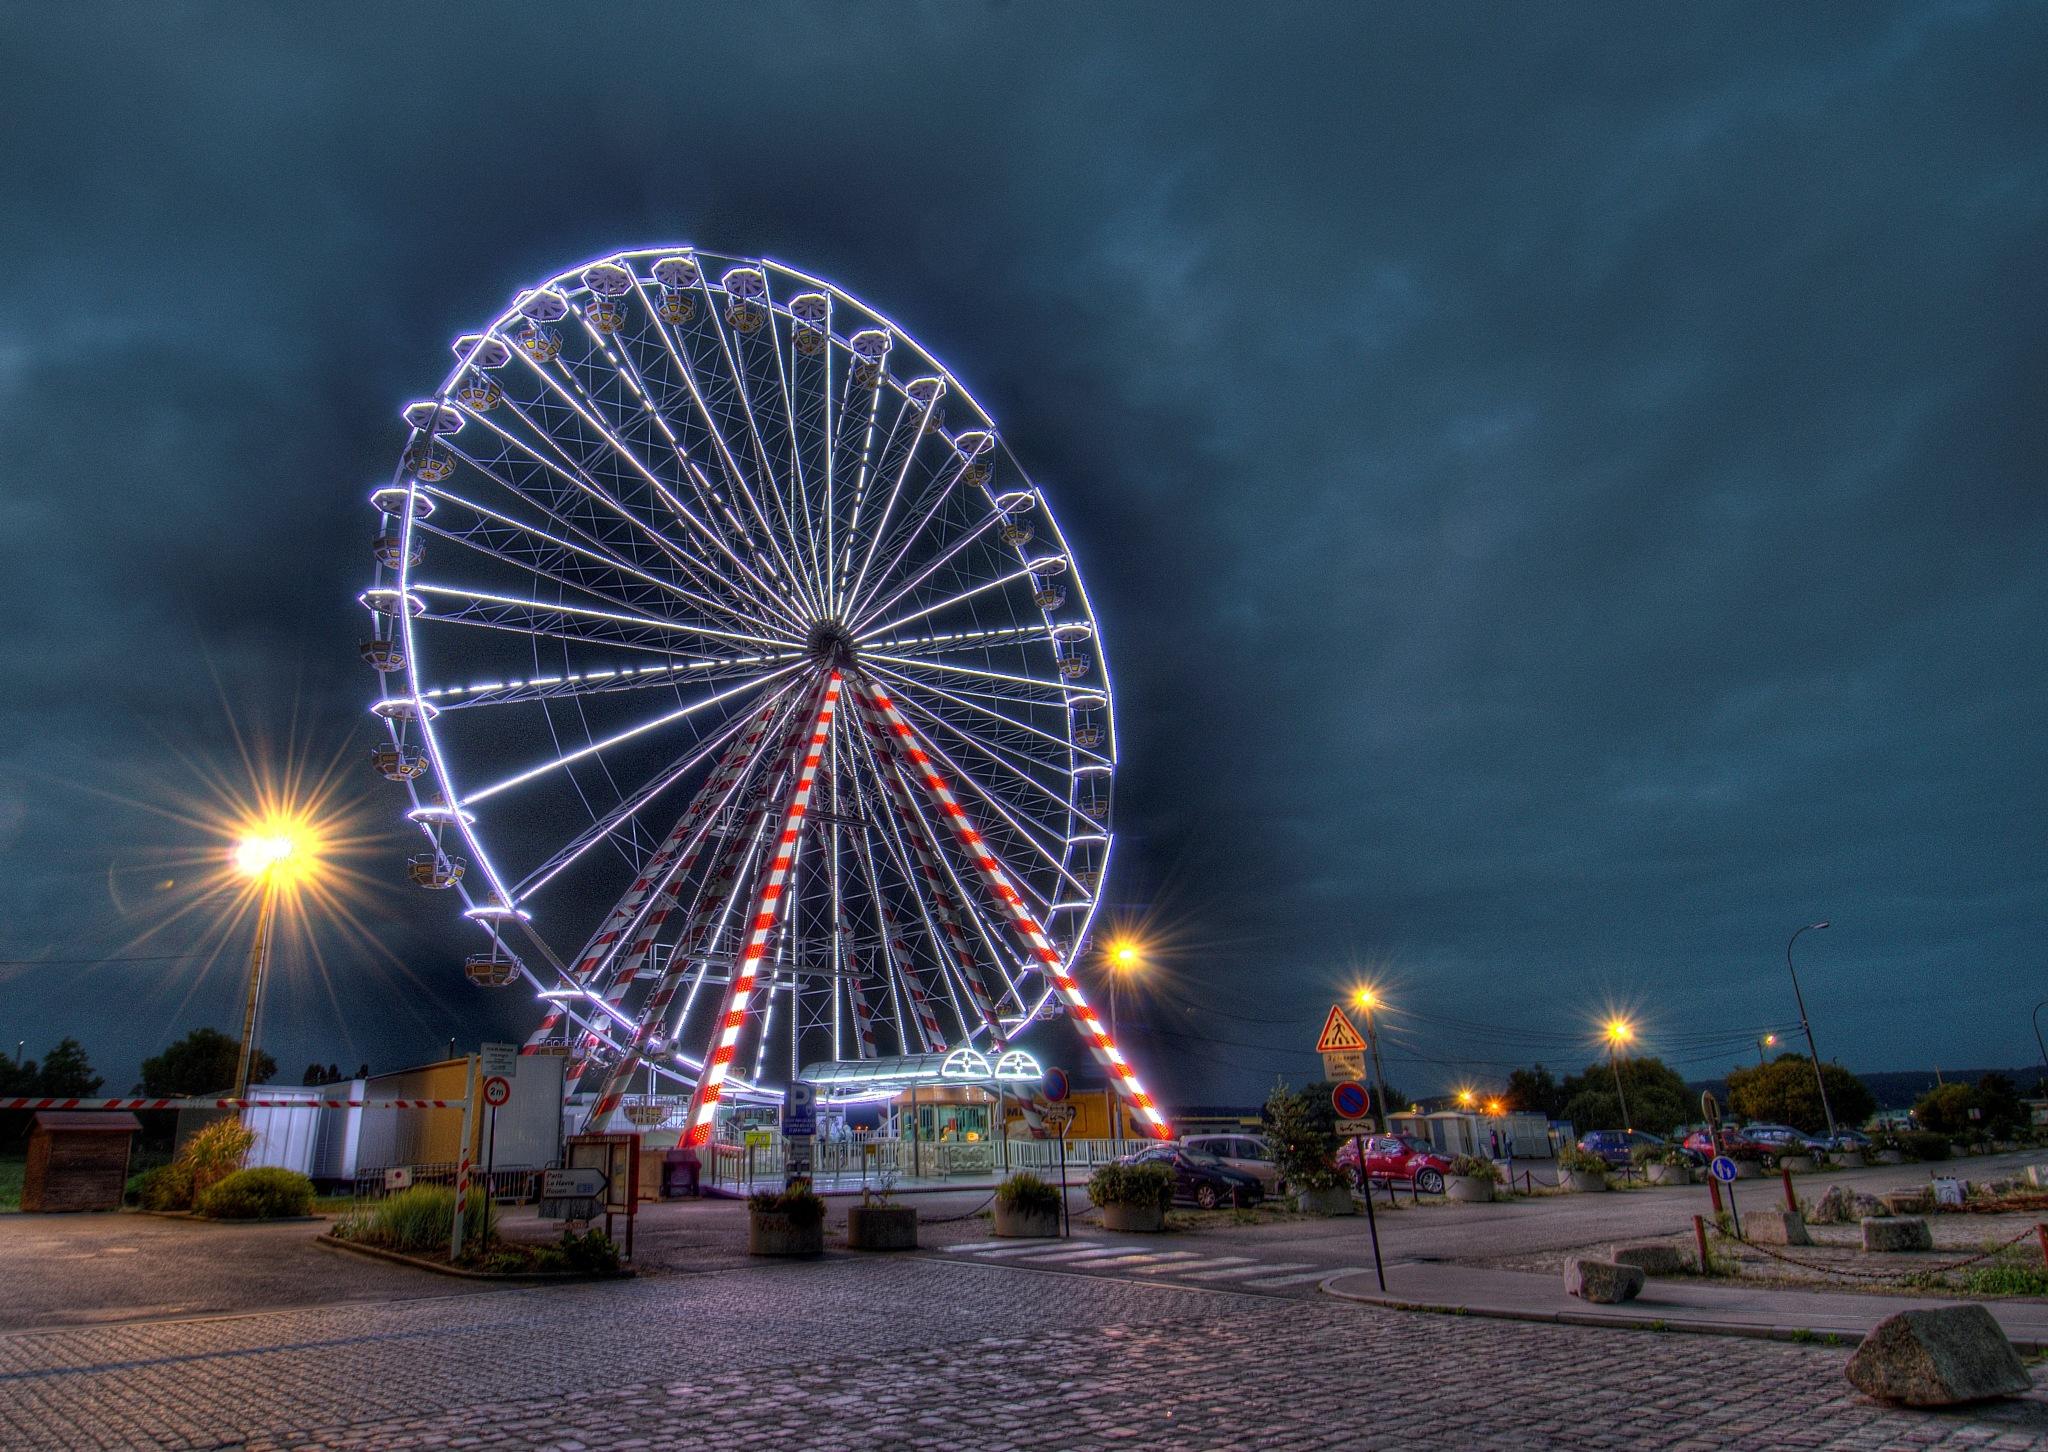 Wheel Of Fortune  by yawazzuk